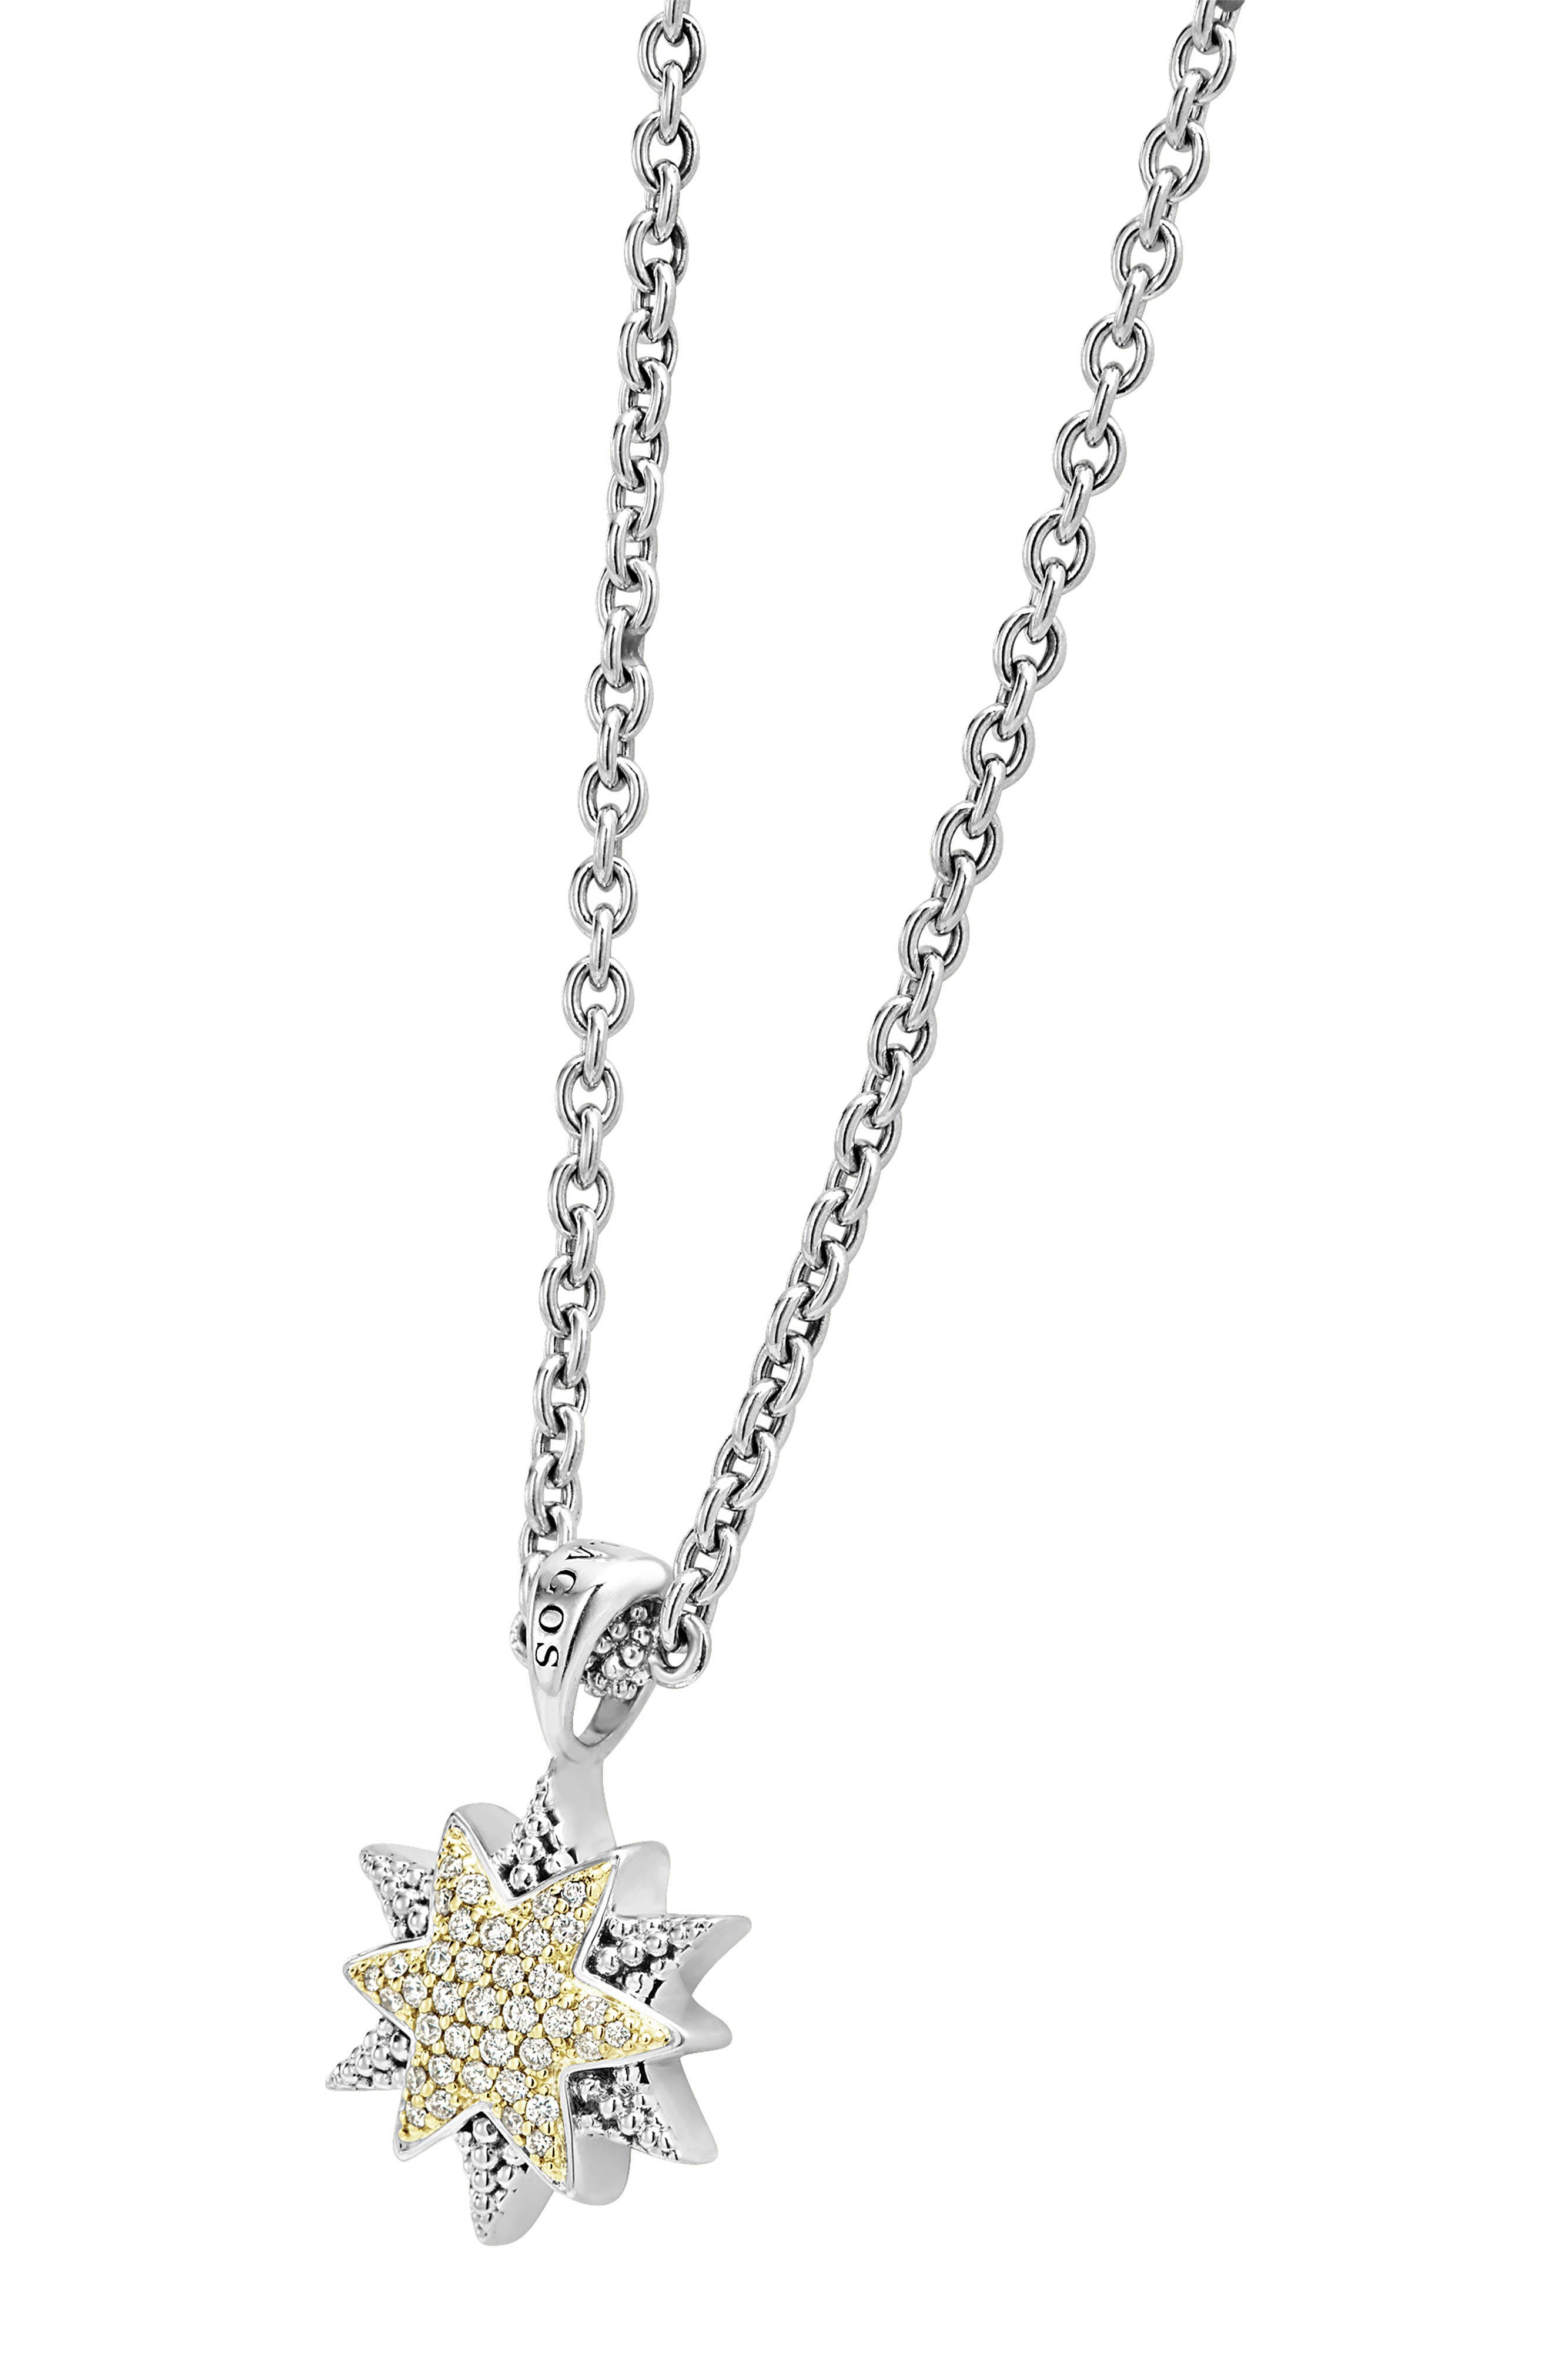 North Star Small Diamond Pendant Necklace,                             Alternate thumbnail 3, color,                             DIAMOND